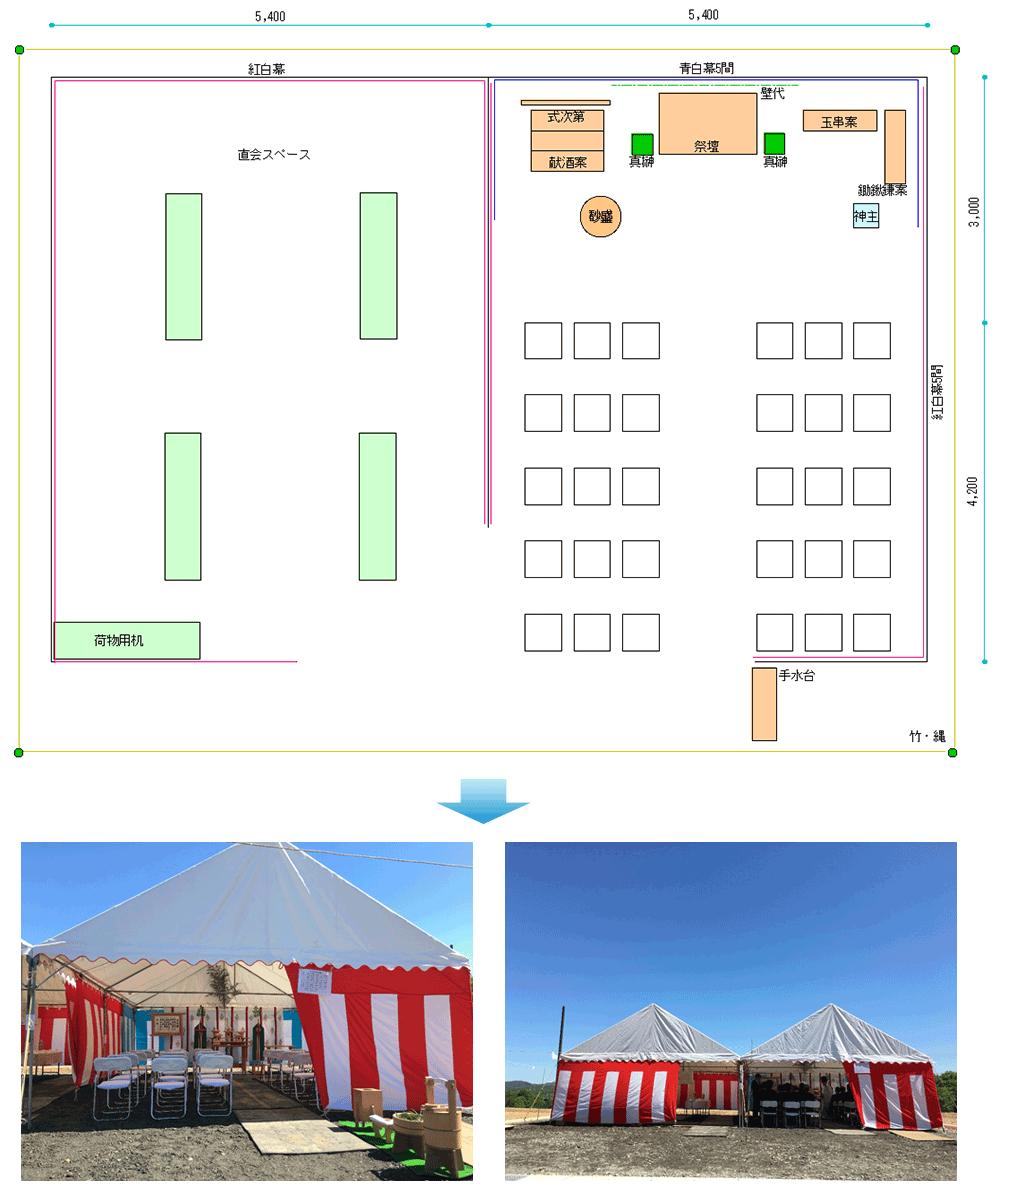 layout3x43x4